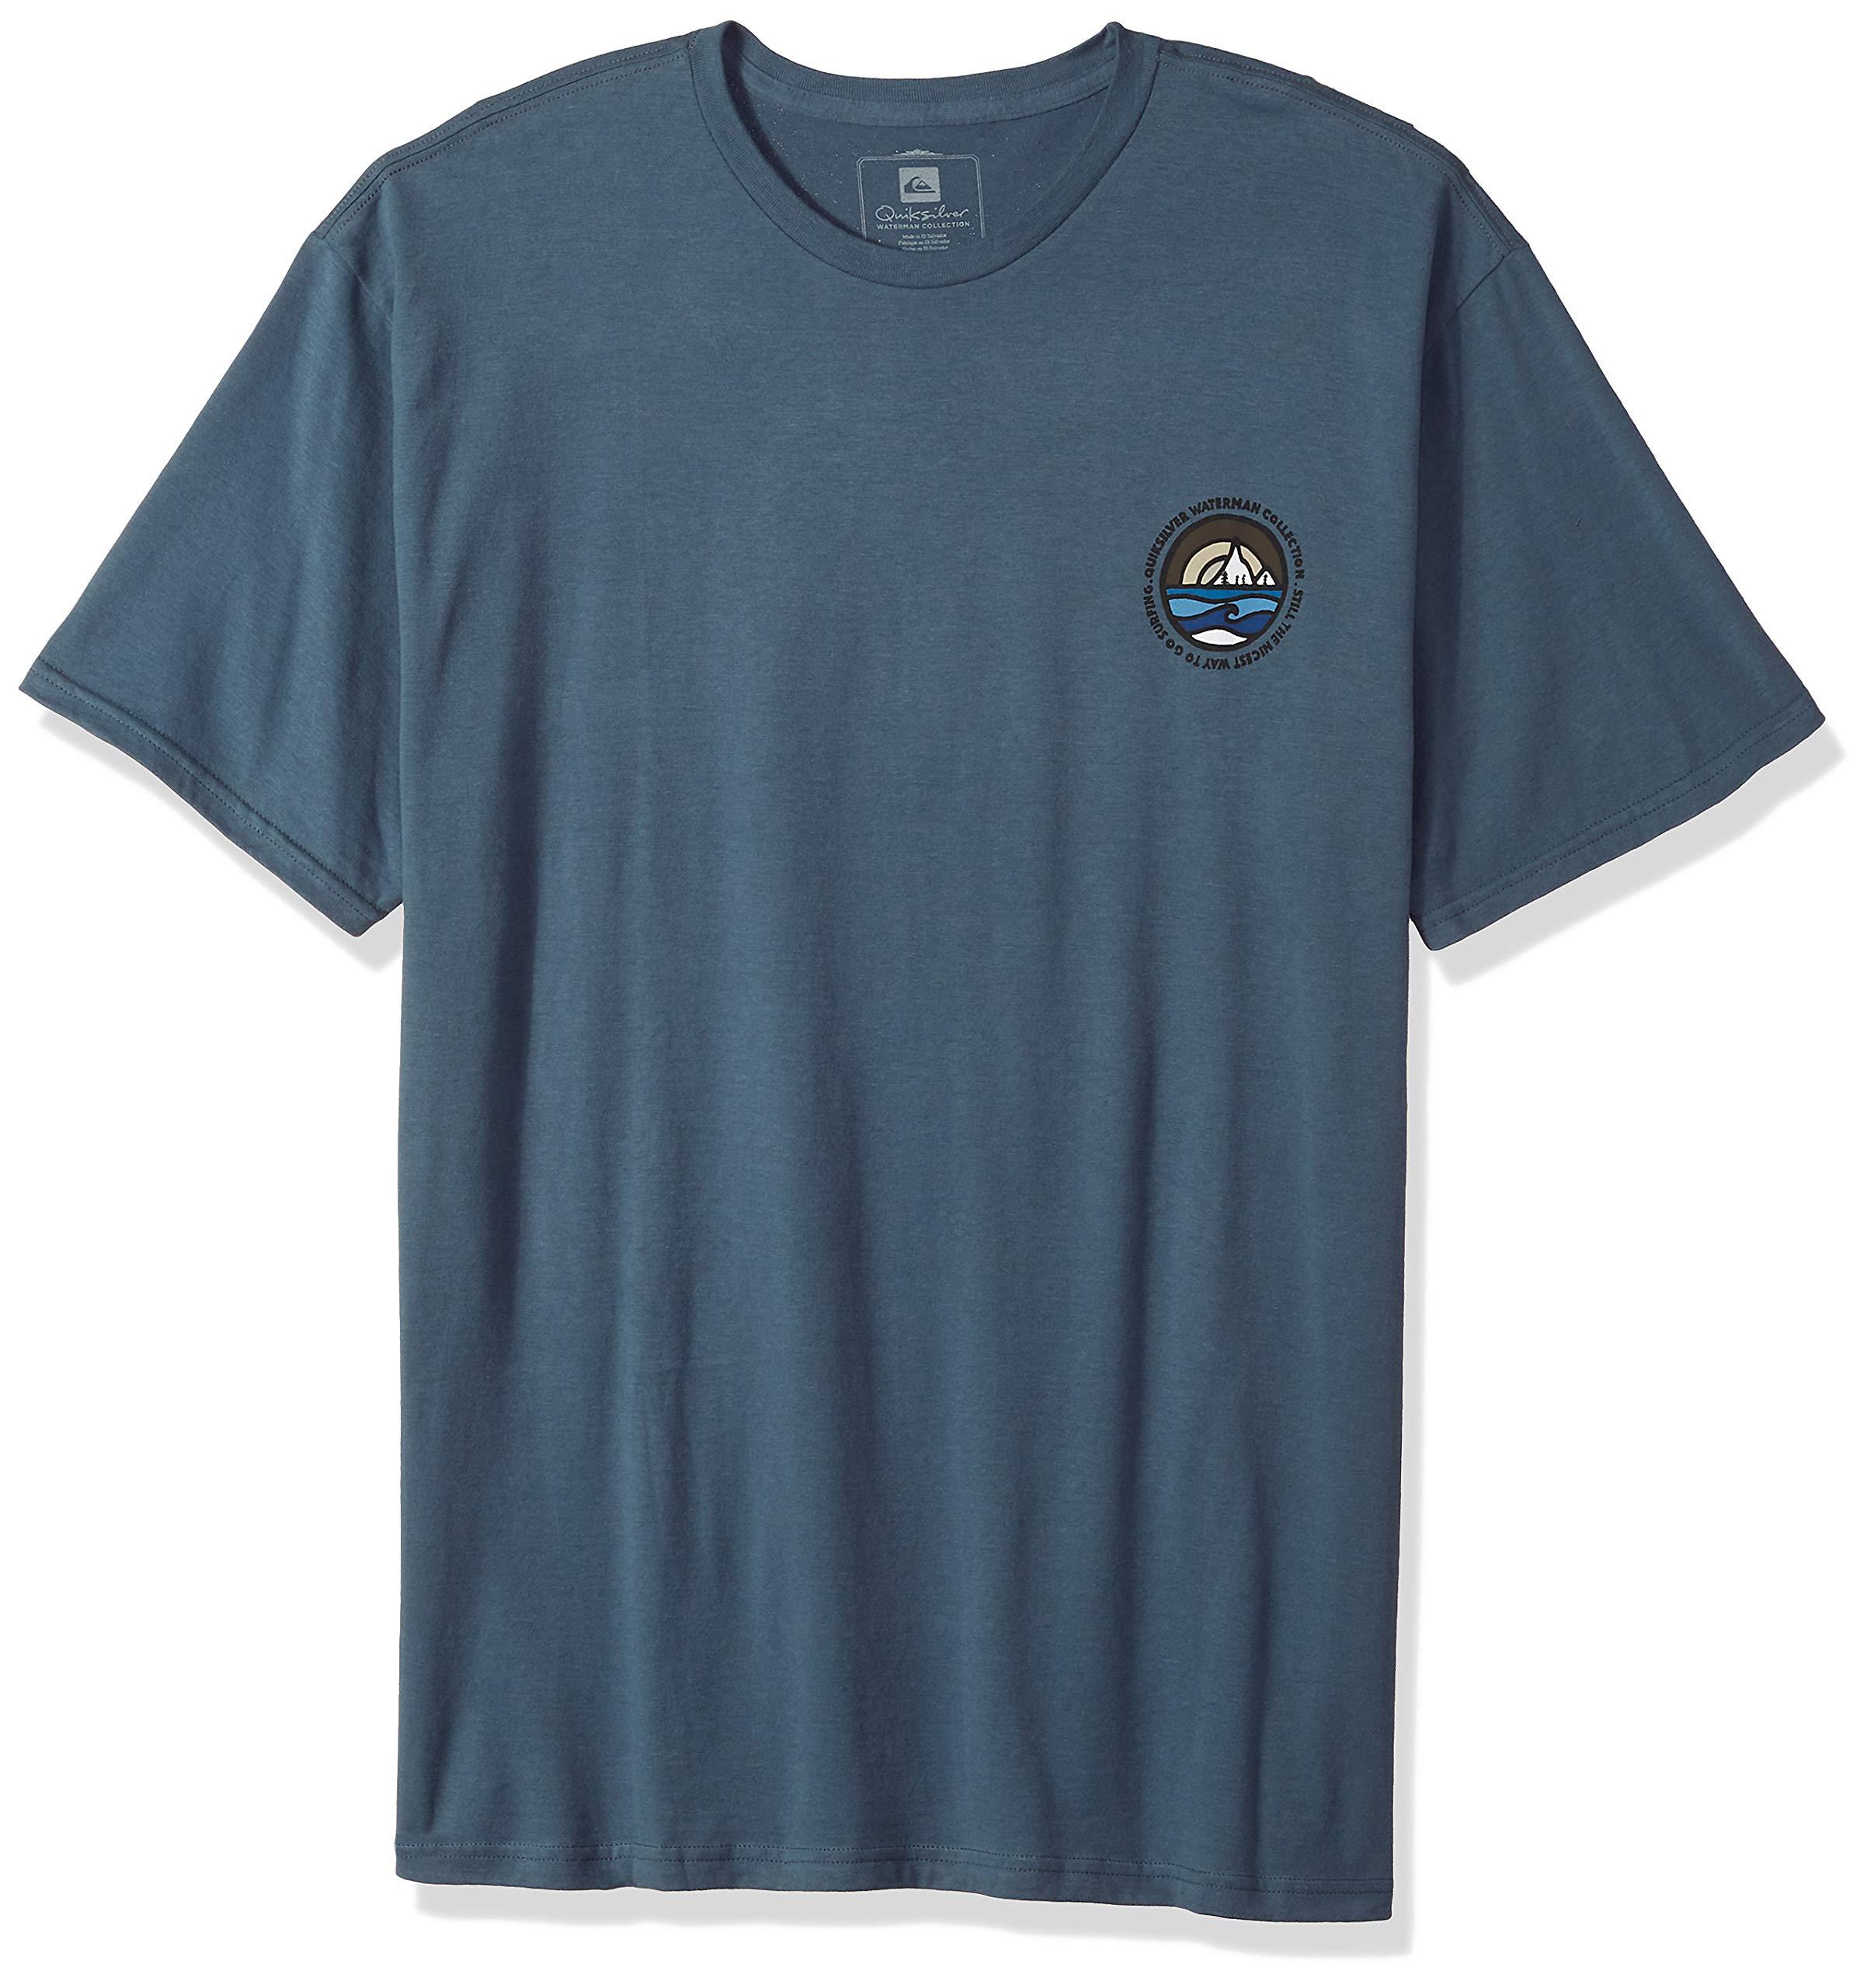 Quiksilver Men's Northwest TEE Shirt, Orion Blue, M